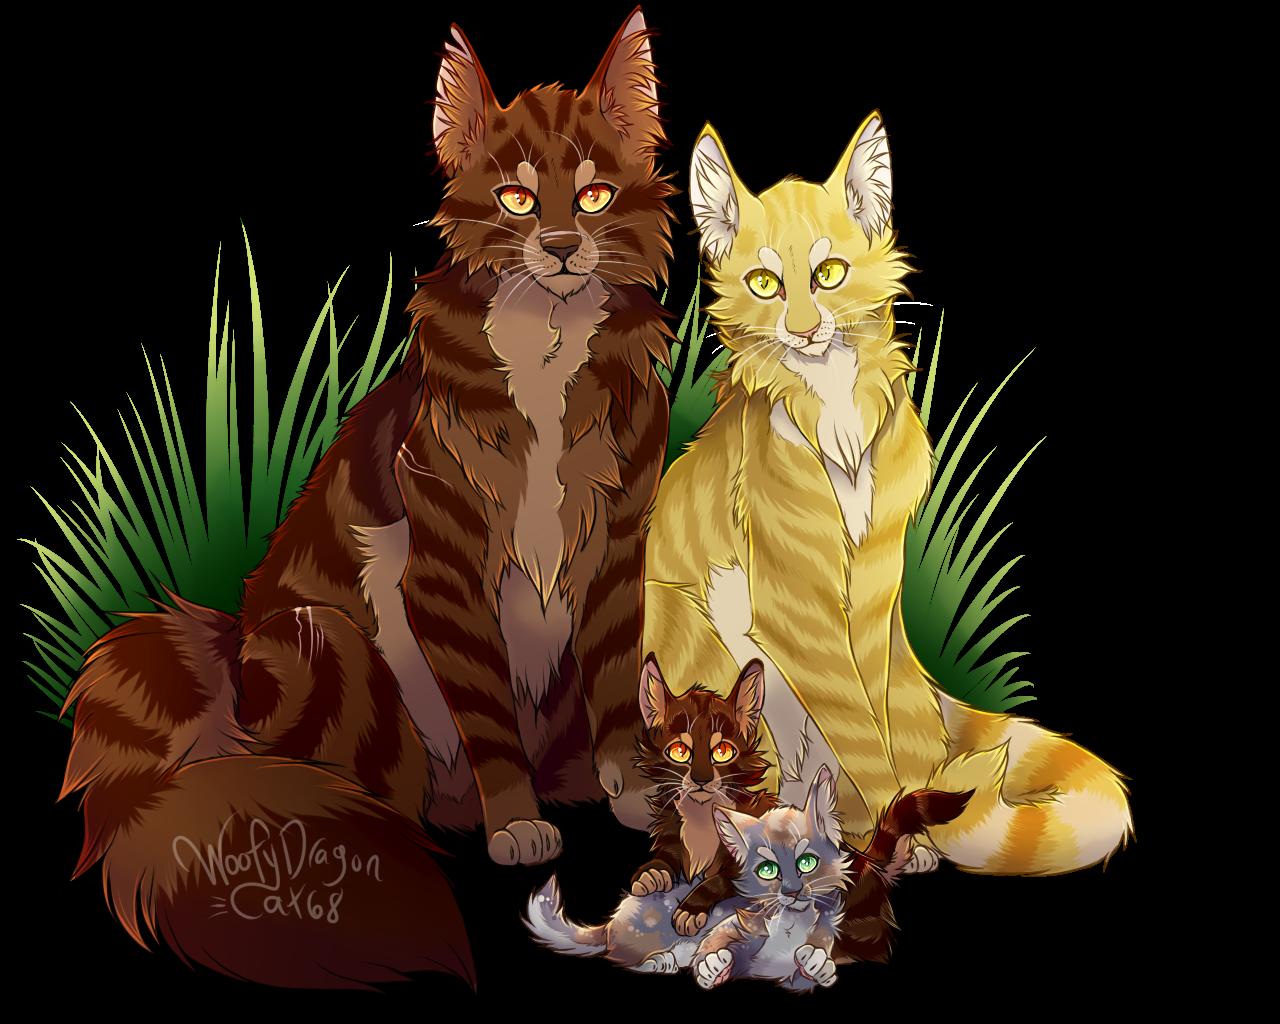 Výsledek obrázku pro warriors cats golden flower